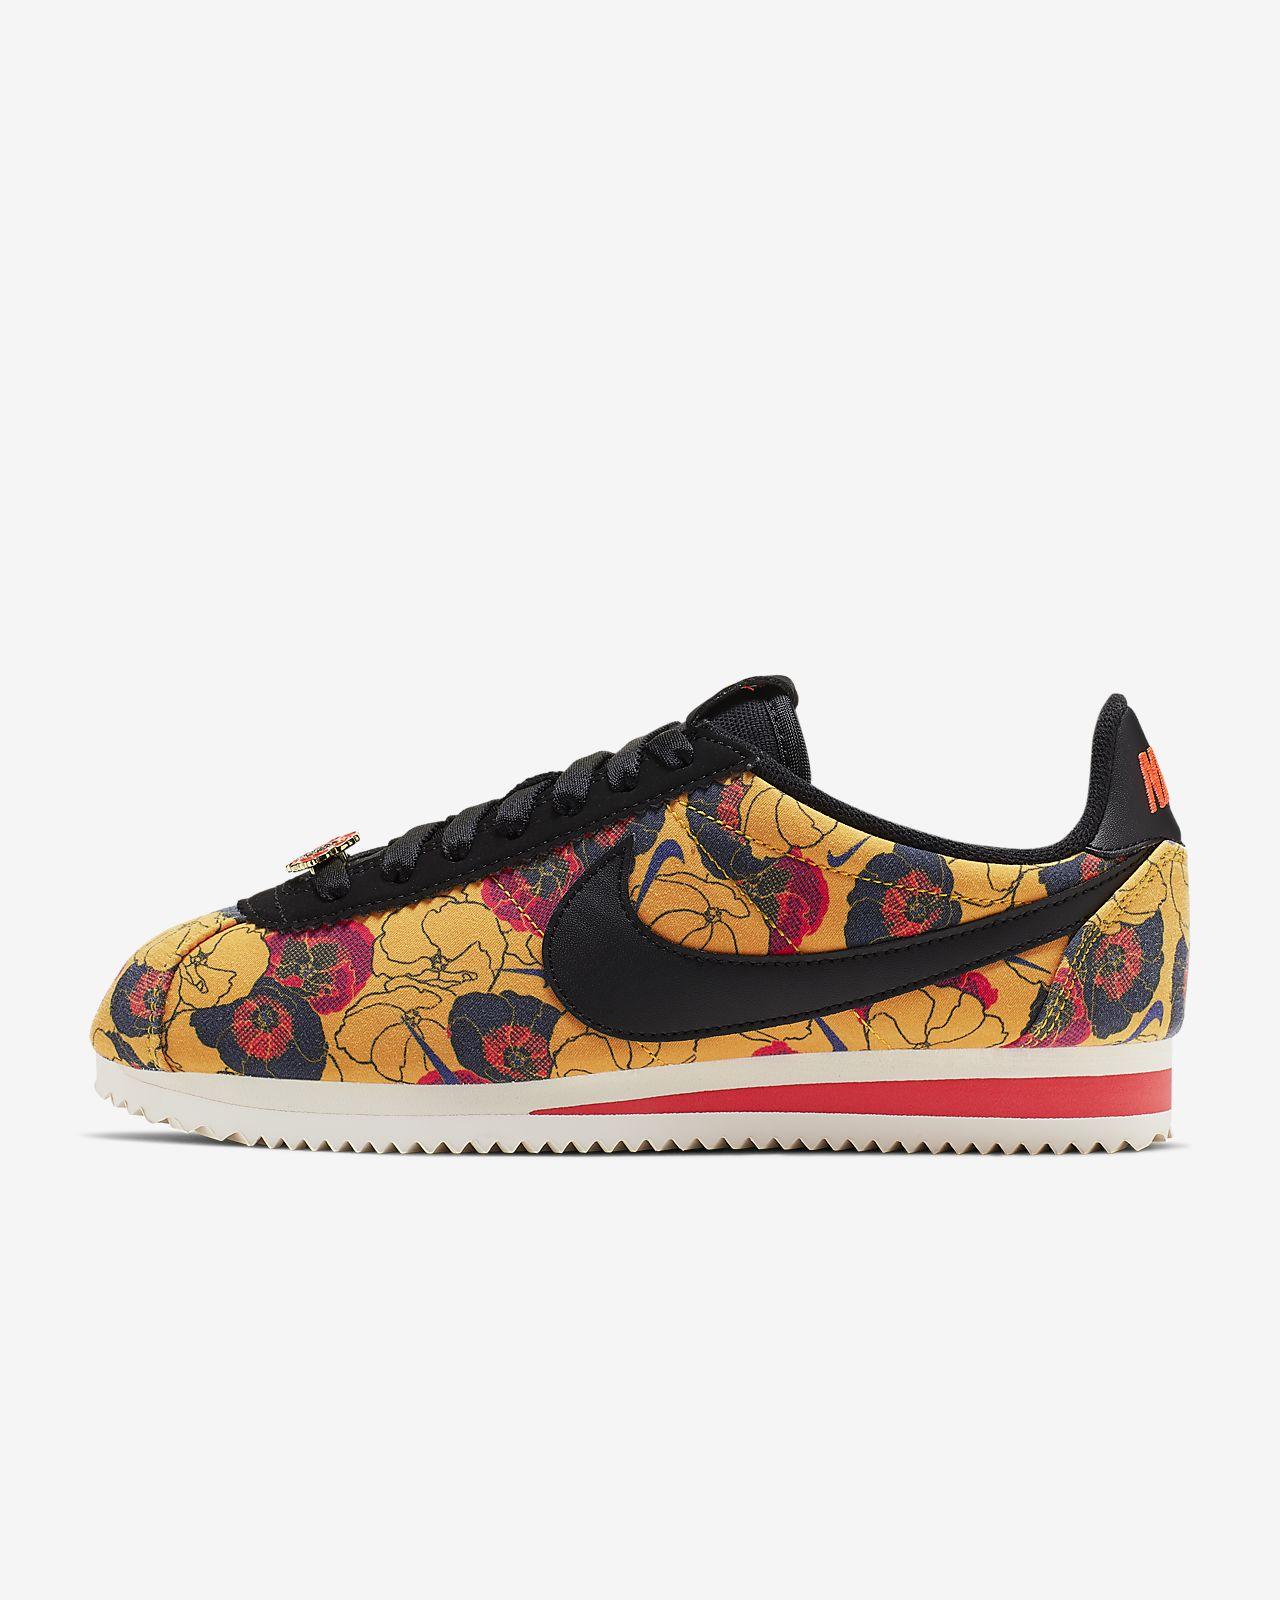 half off 76860 f424e ... Nike Classic Cortez LX Floral Damesschoen